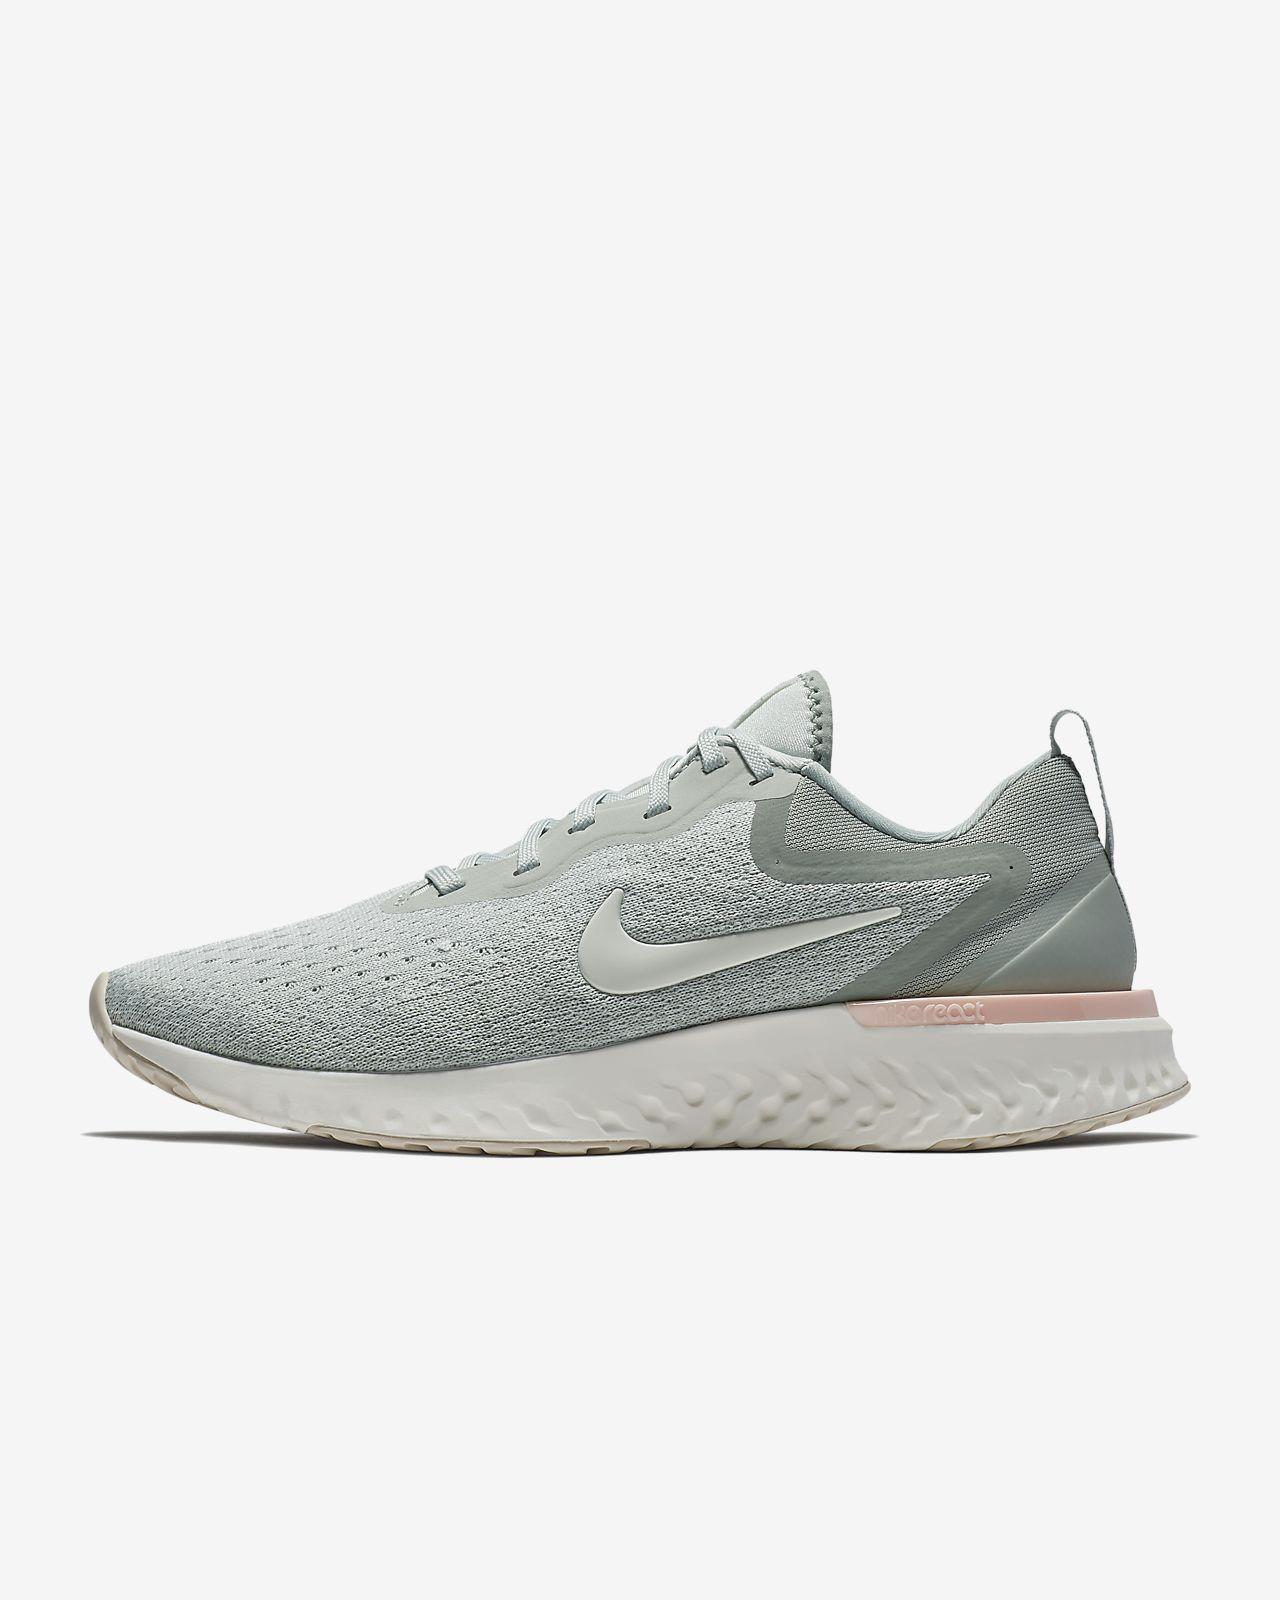 quality design 9c214 3efb9 Nike Odyssey React